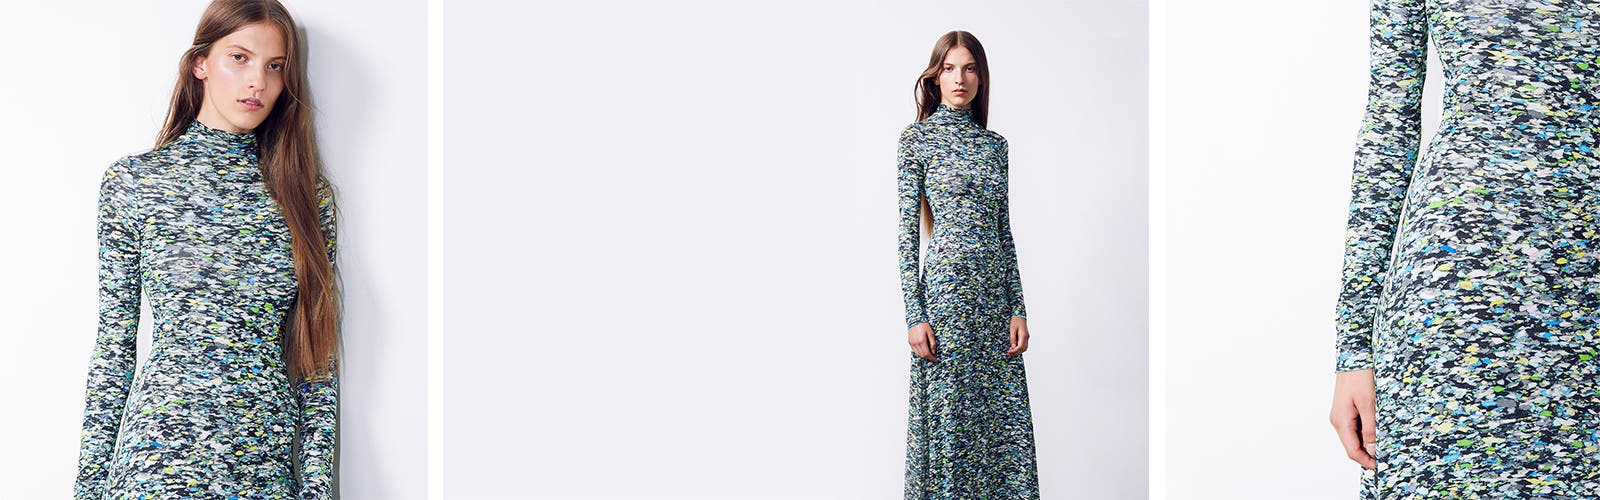 Designer dresses.